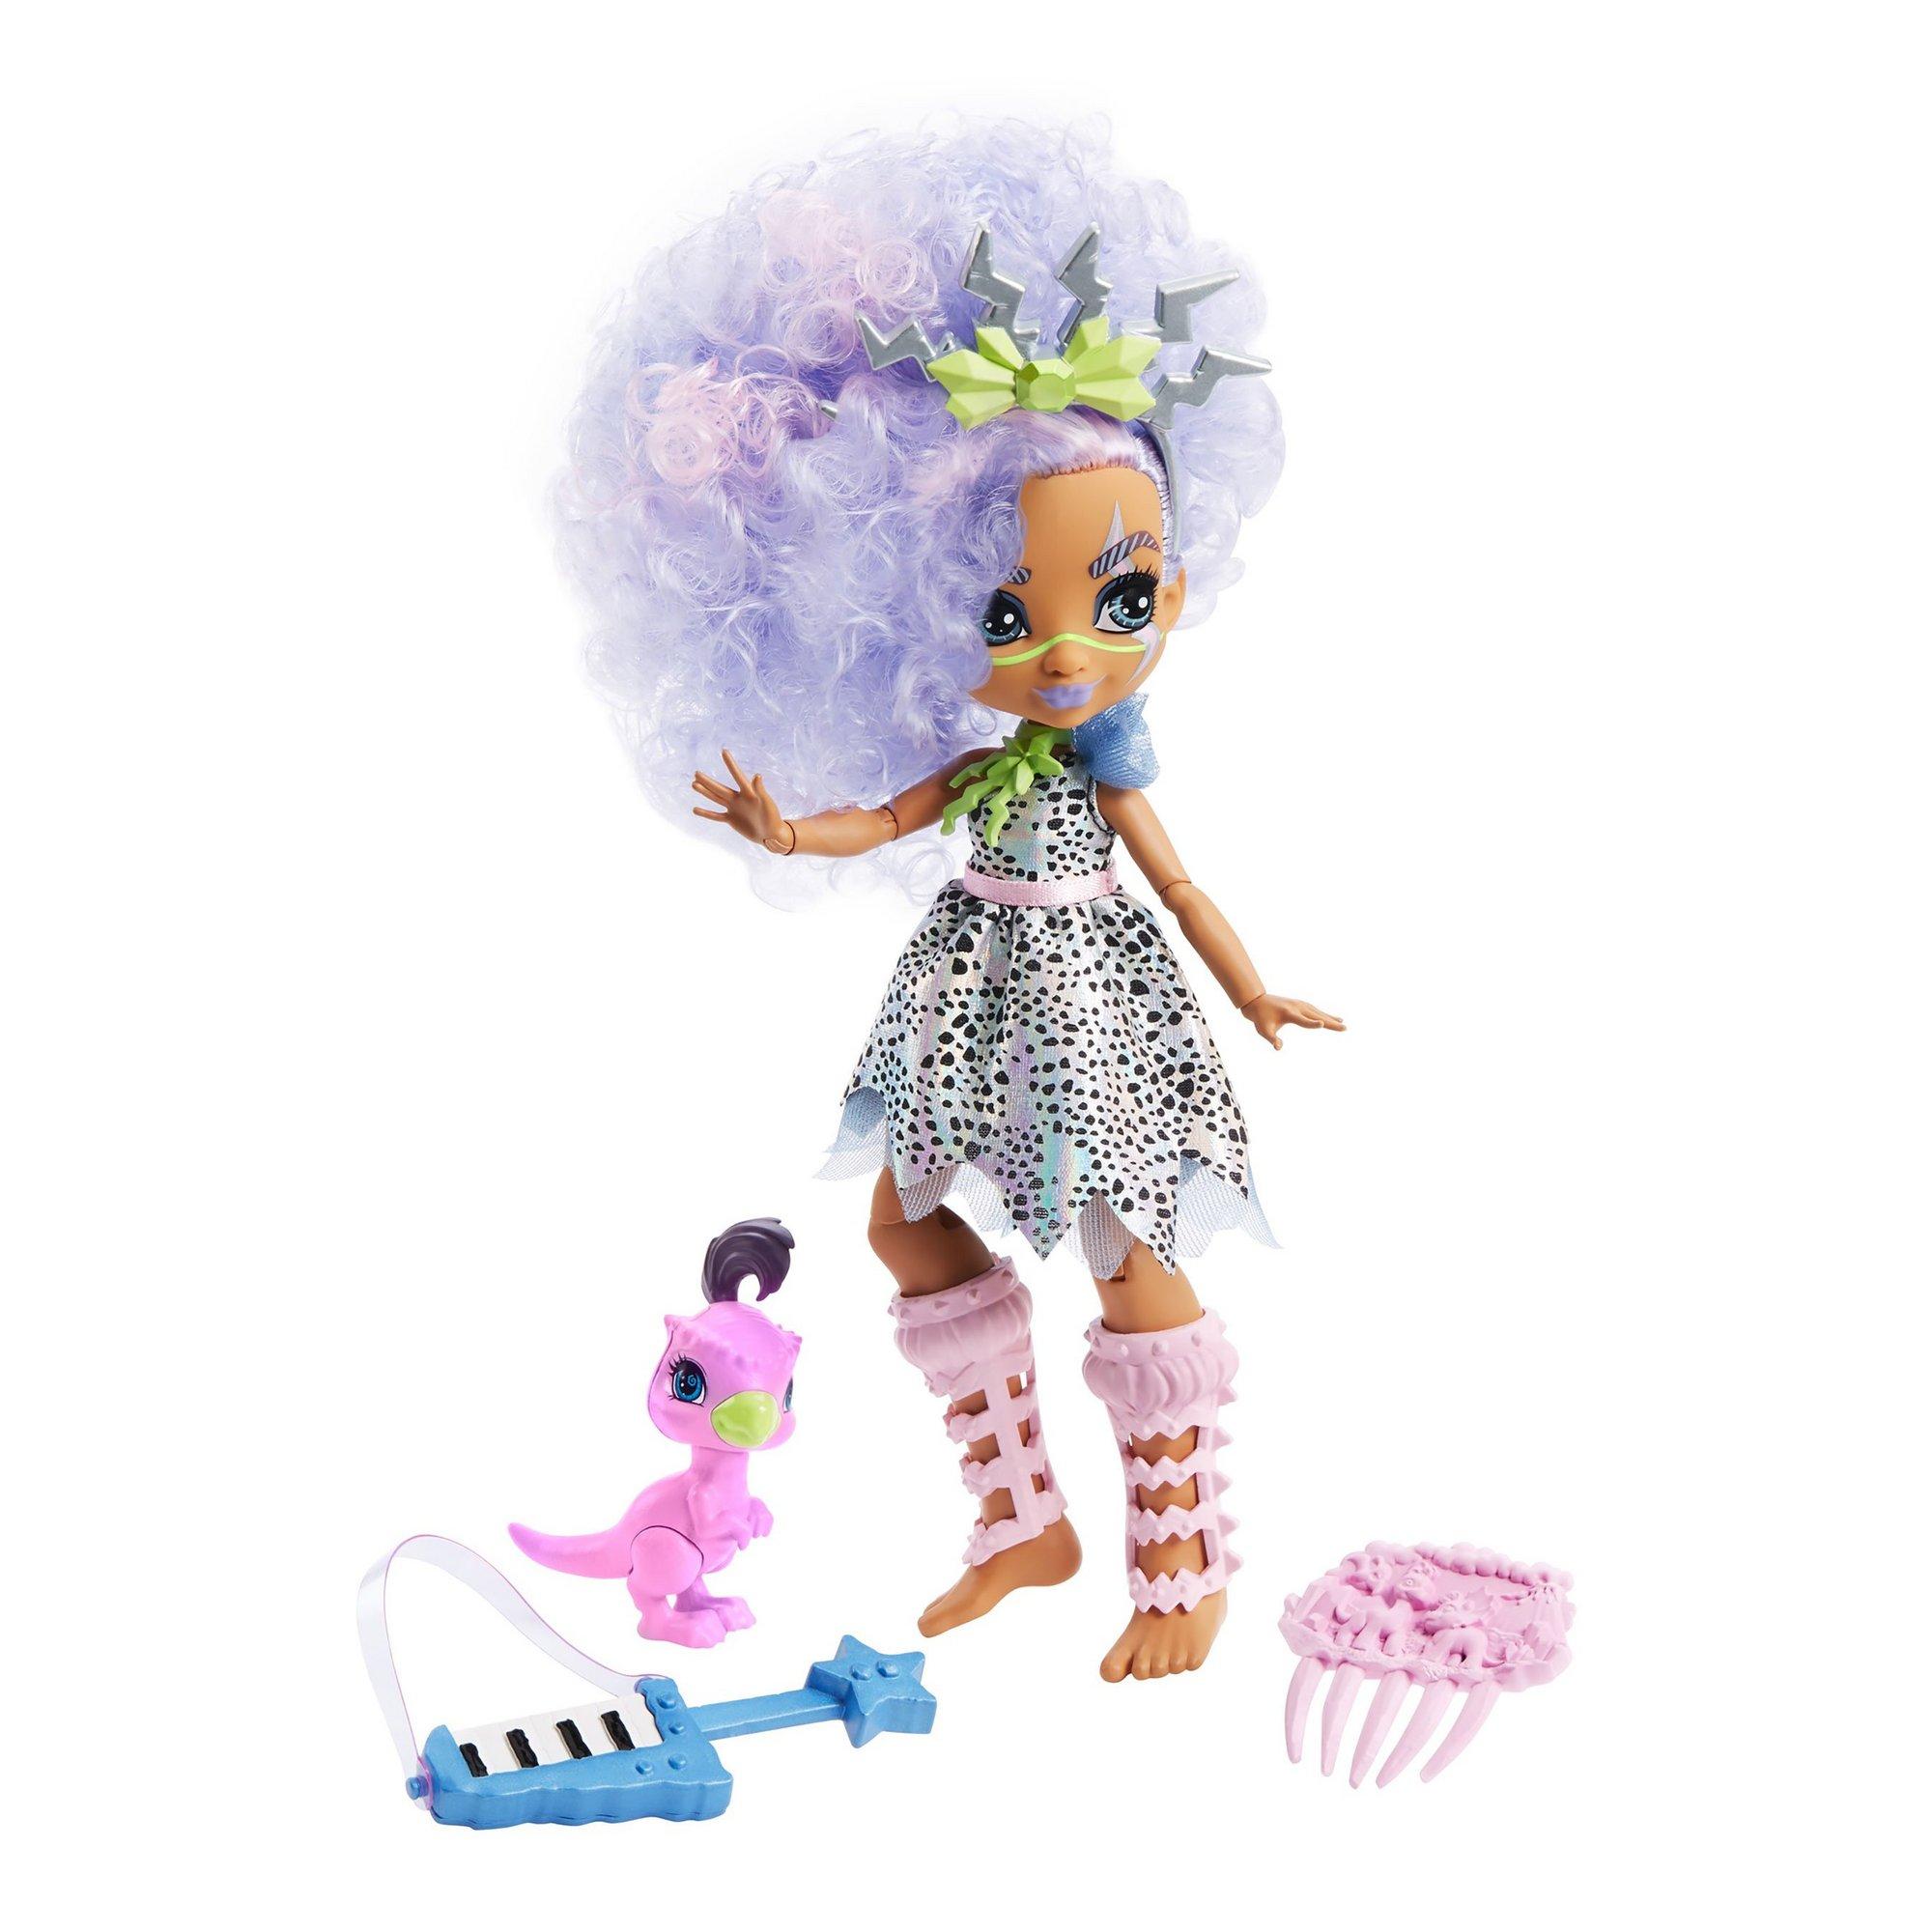 Image of Cave Club Bashley Doll